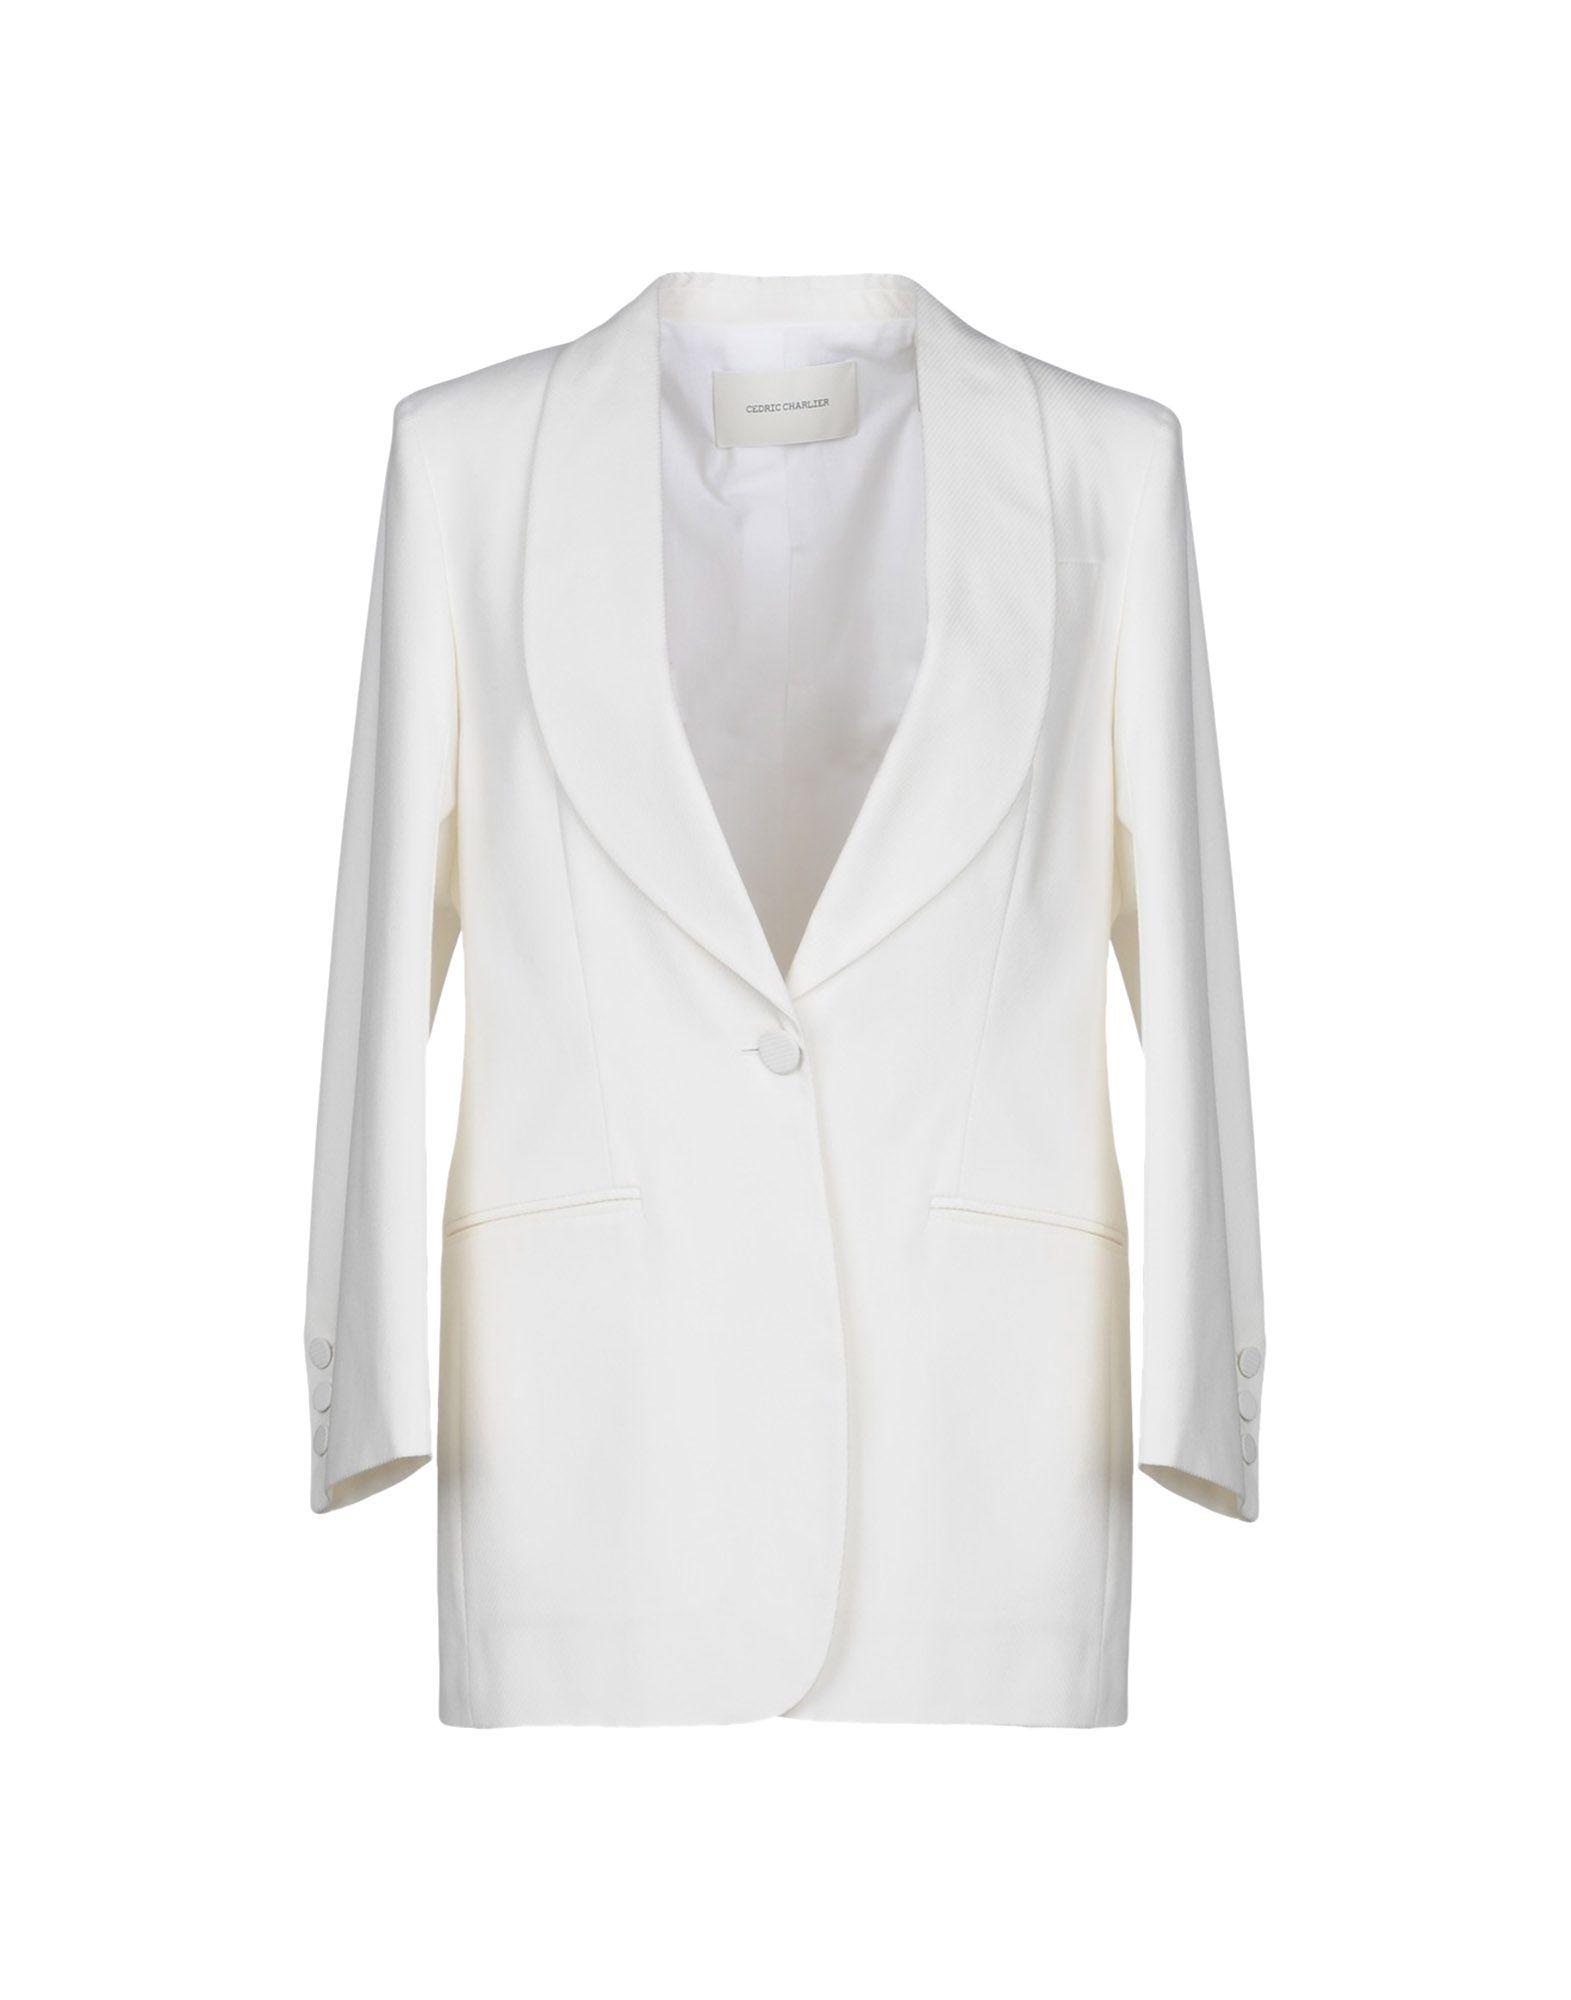 CEDRIC CHARLIER Пиджак пиджак cedric charlier белый